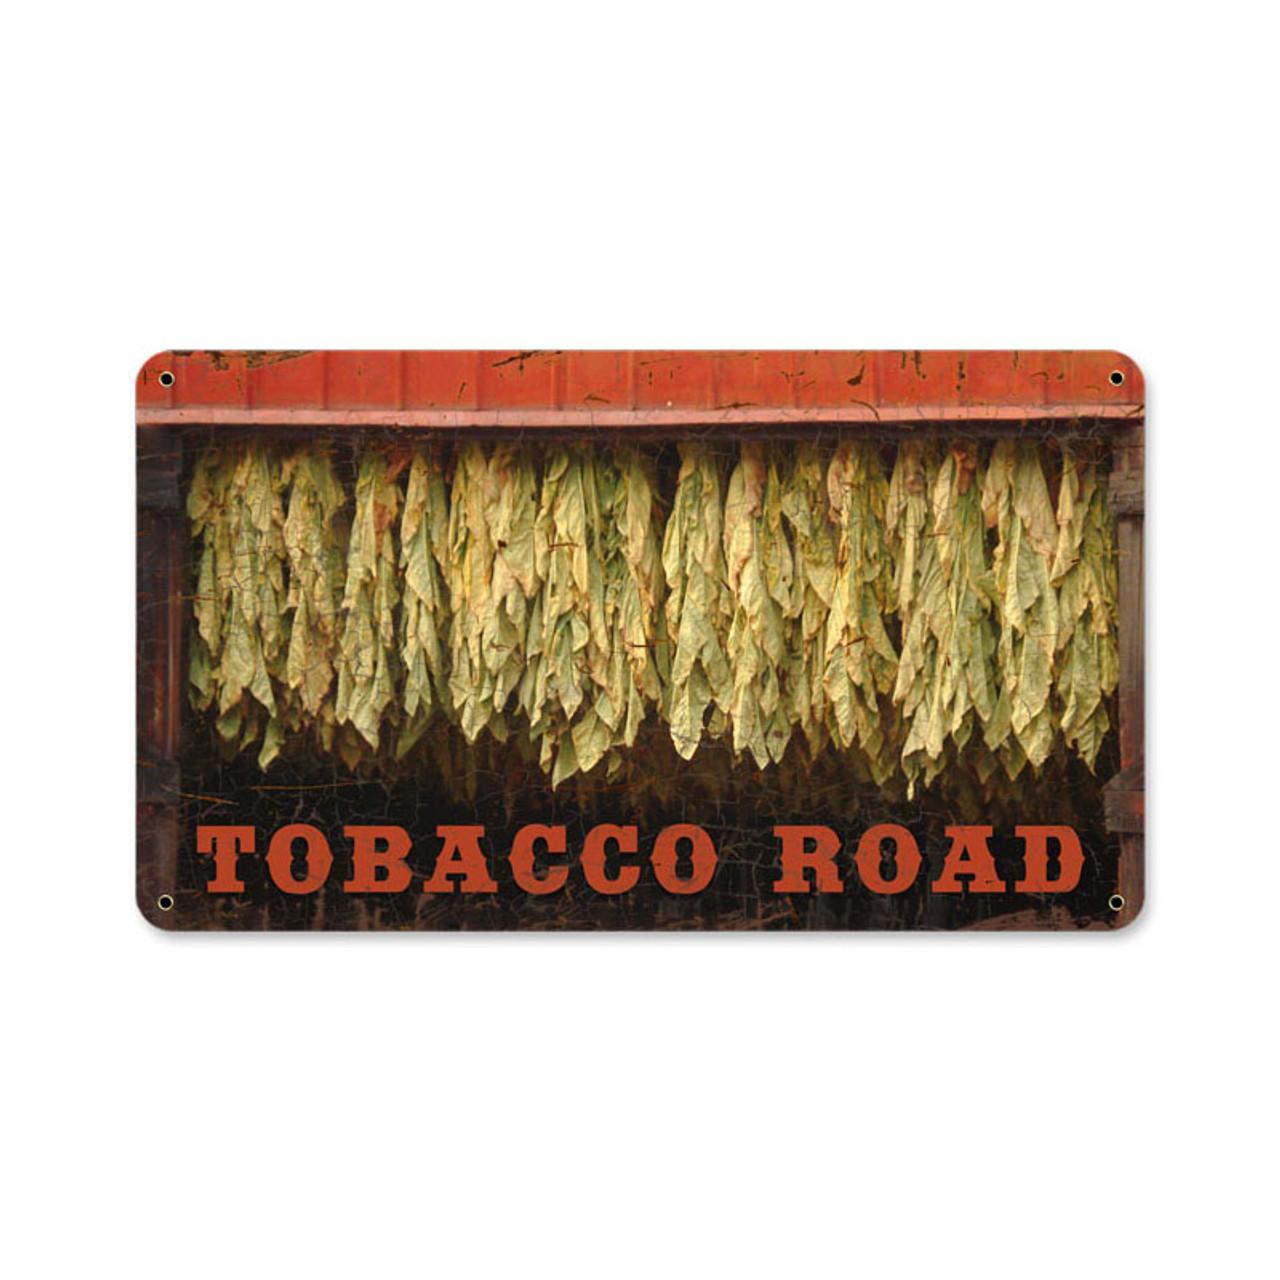 Retro Tobacco Road Metal Sign  14 x 8 Inches